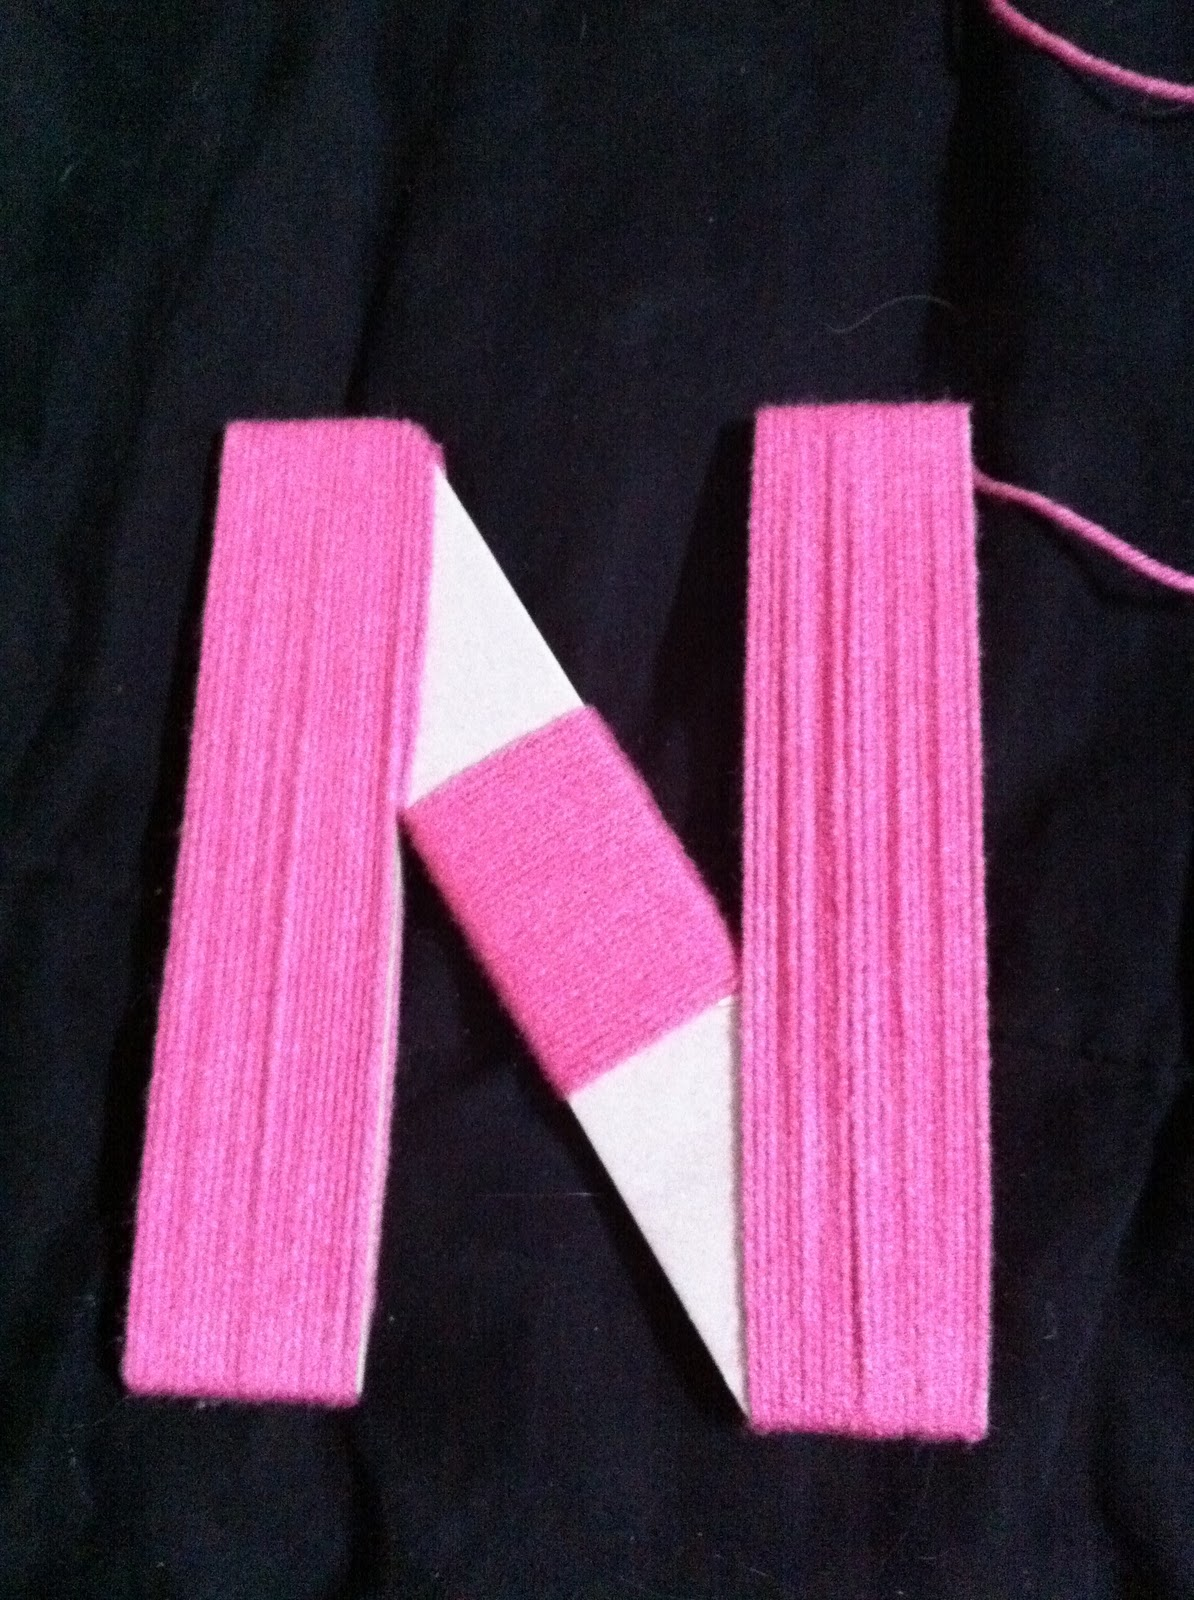 n crafts for kids